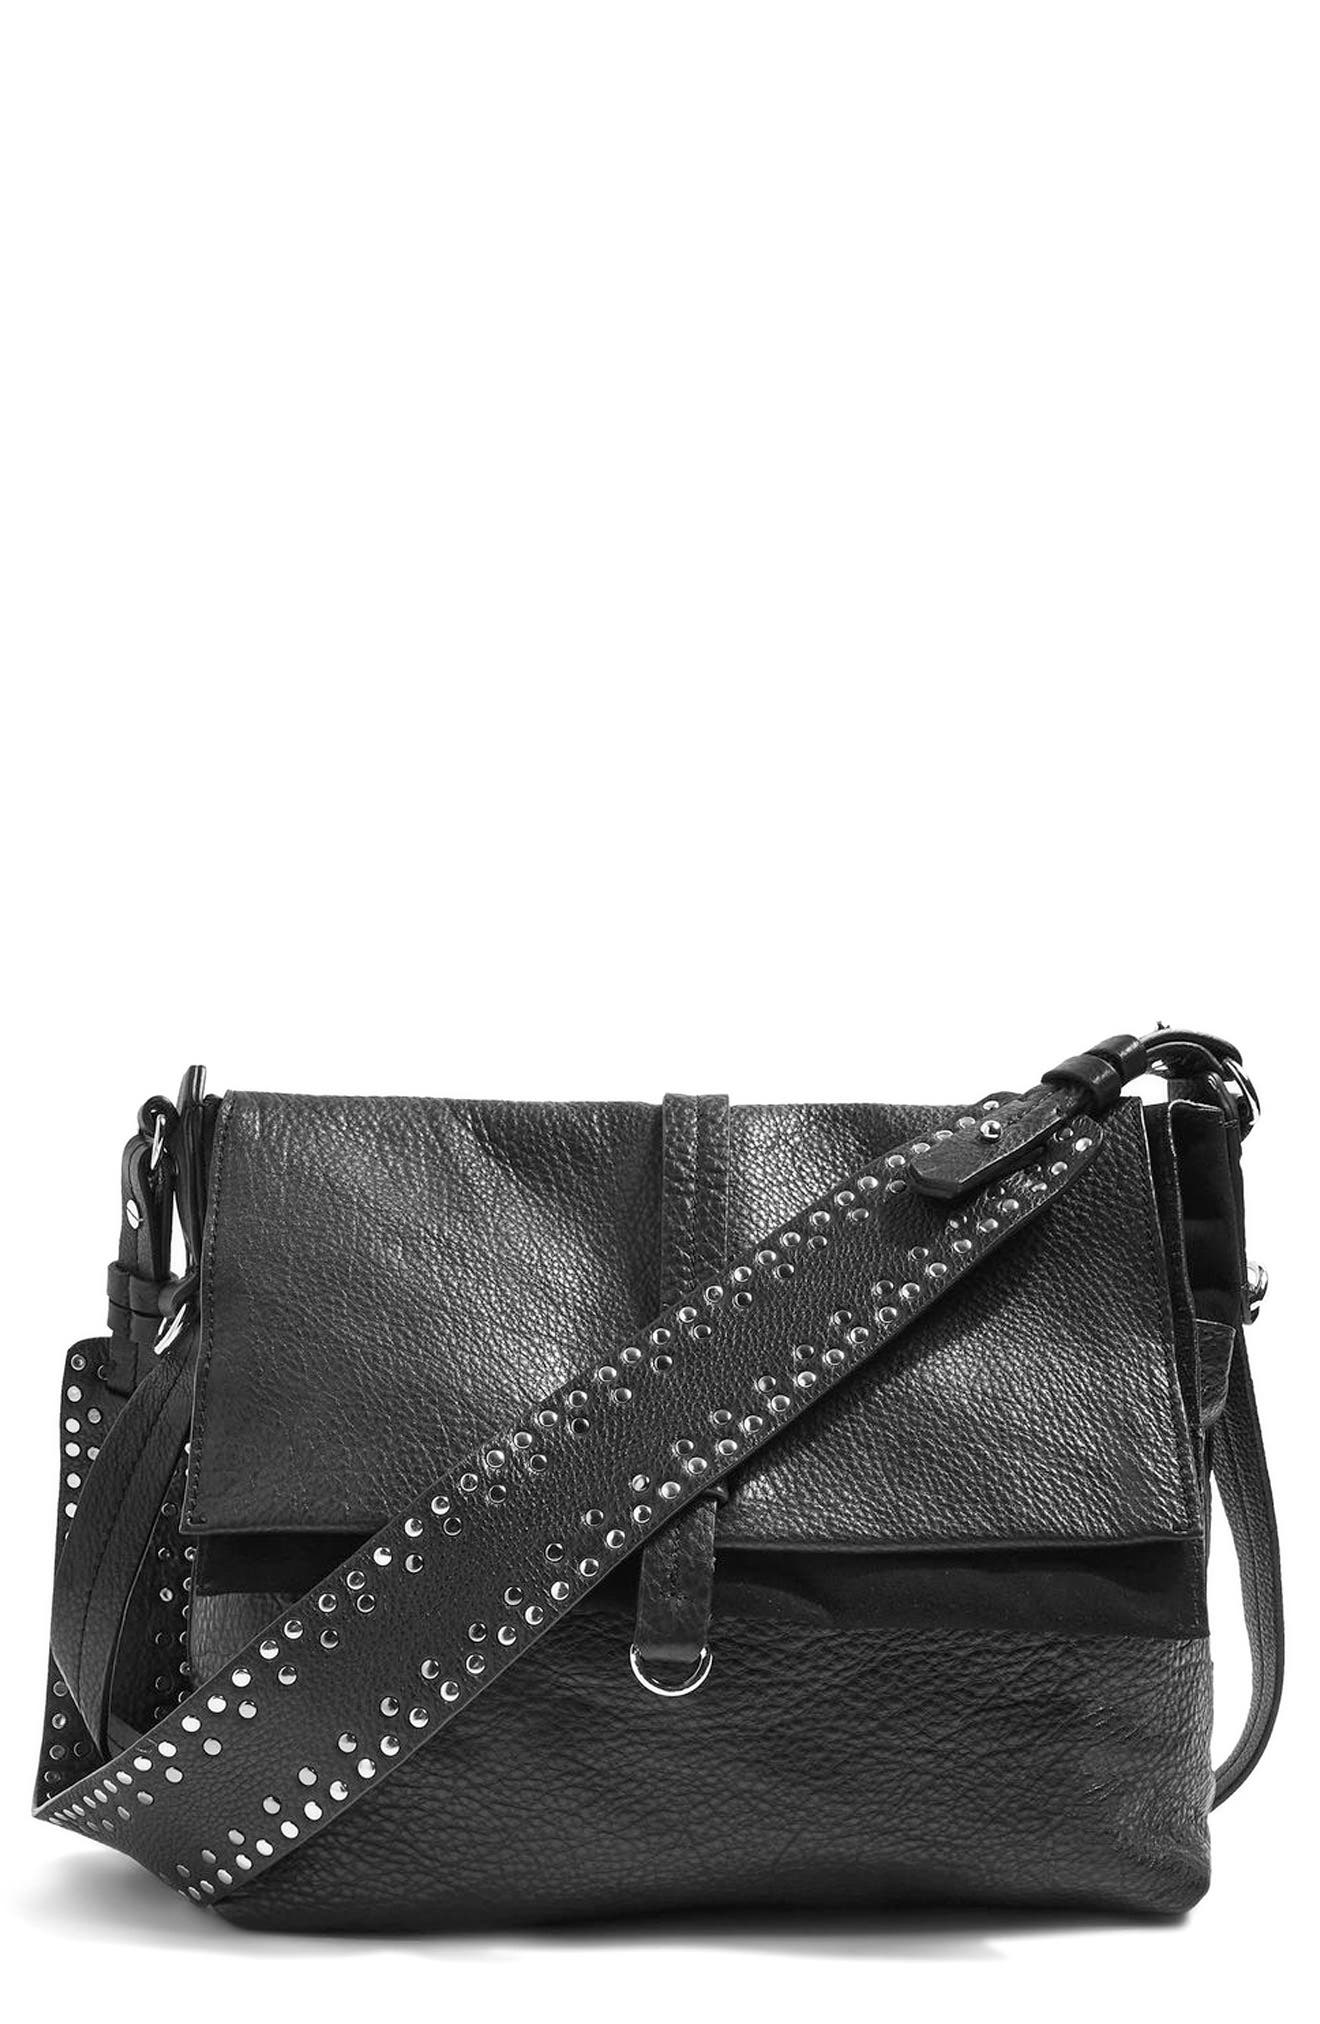 Premium Leather Studded Calfskin Hobo Bag,                             Main thumbnail 1, color,                             Black